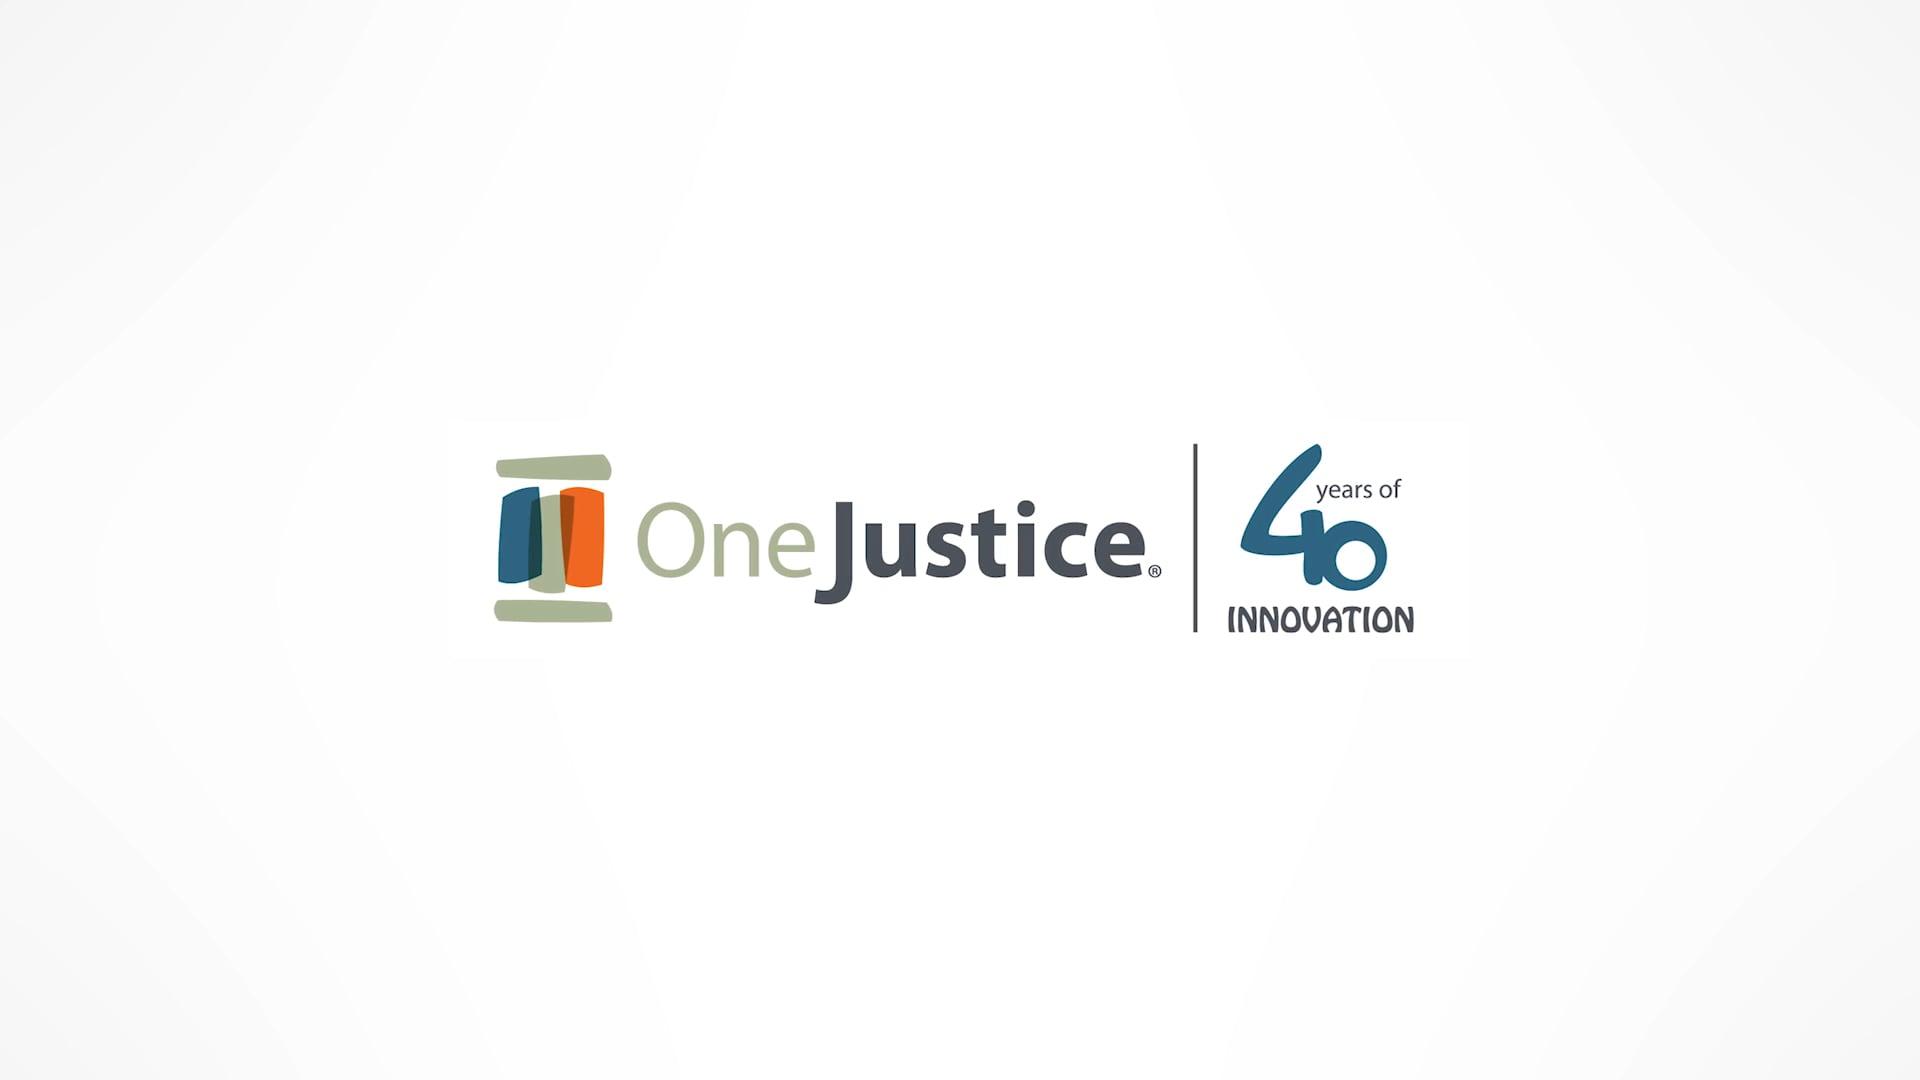 OneJustice - 40th Anniversary